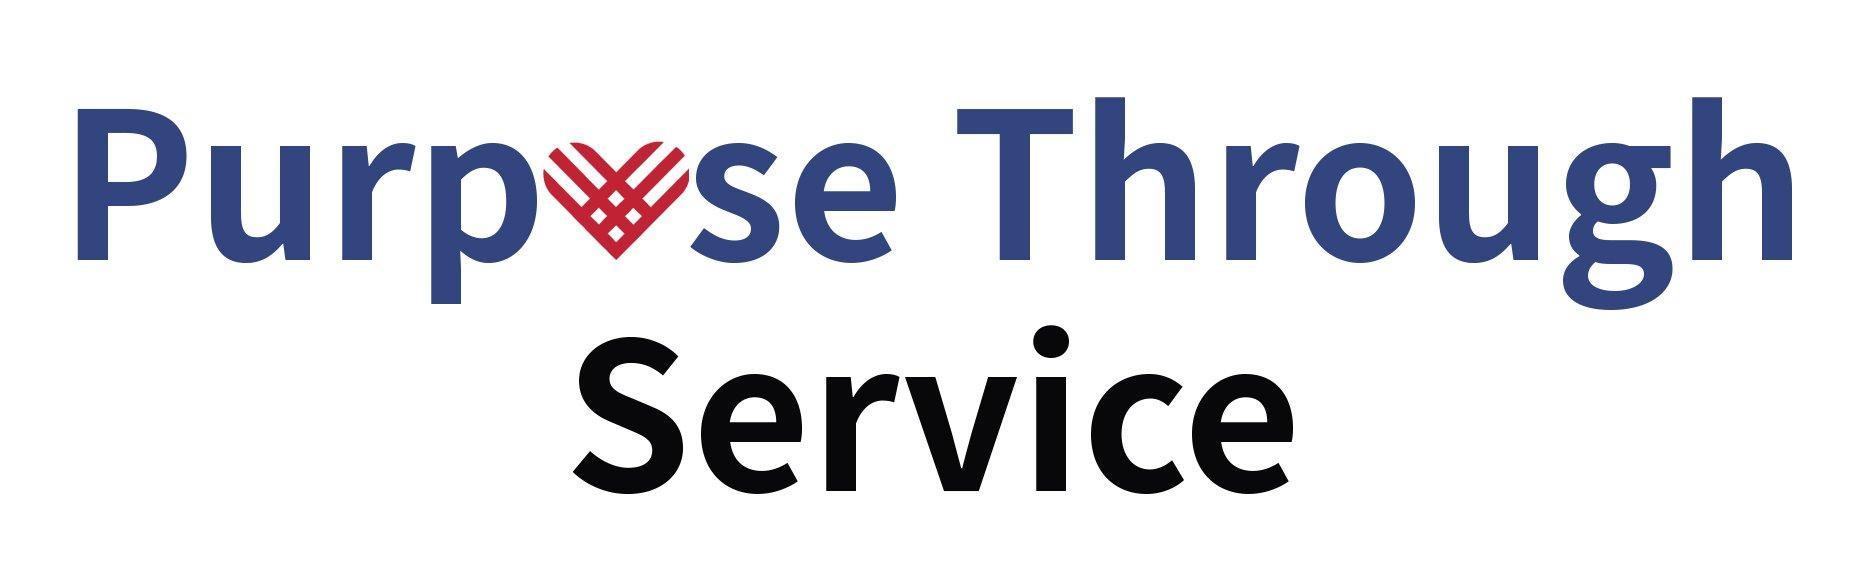 Purpose Through Service Text